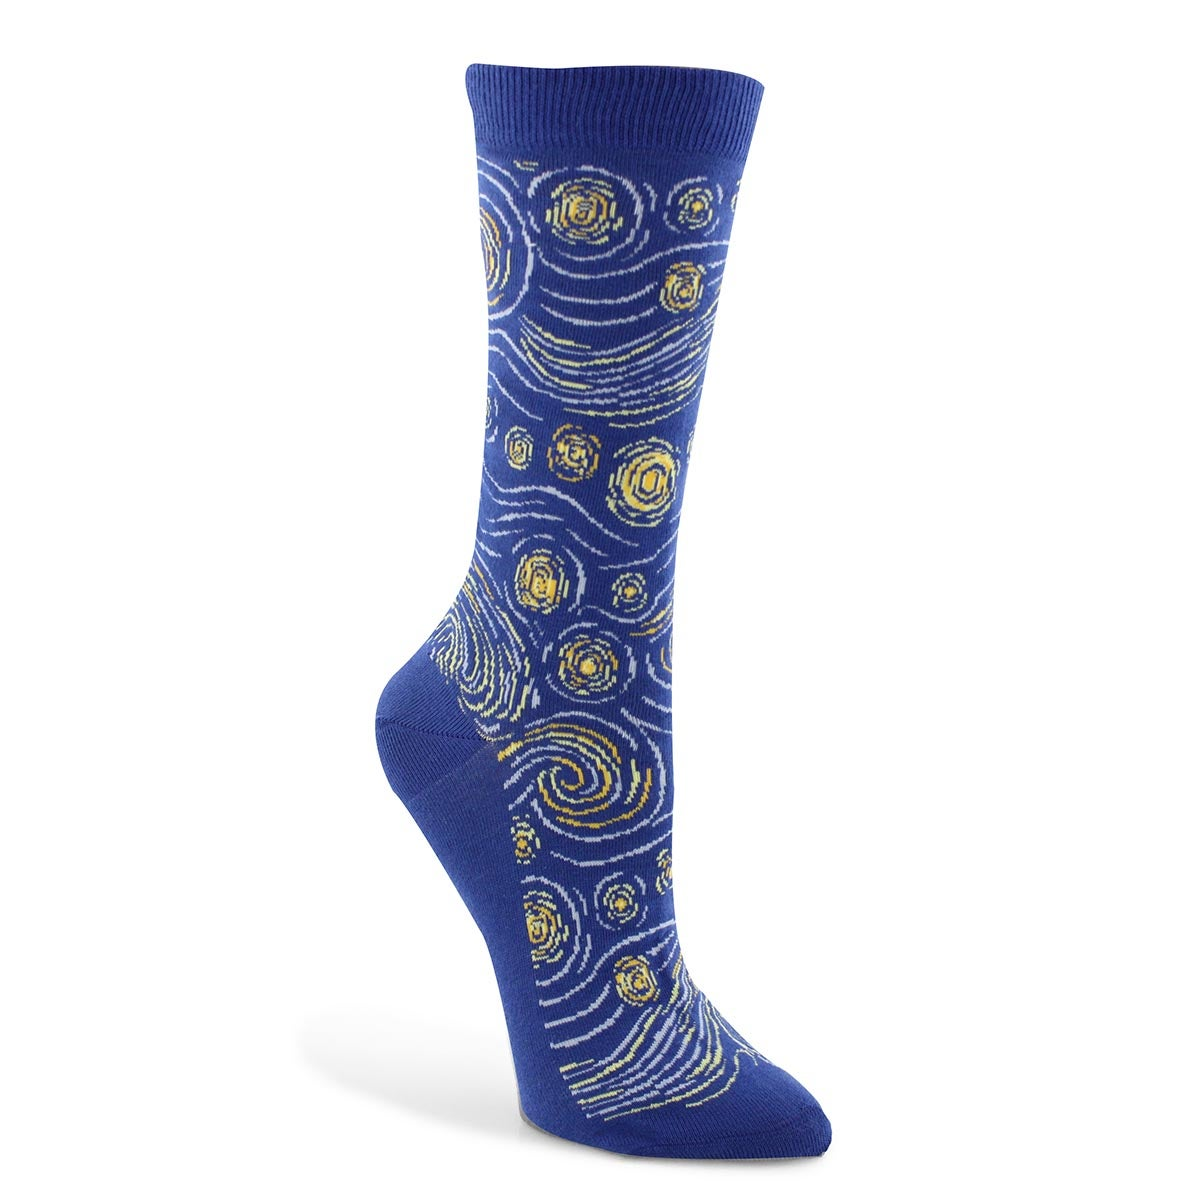 Lds Starry Night Mash Up blu prntd sock